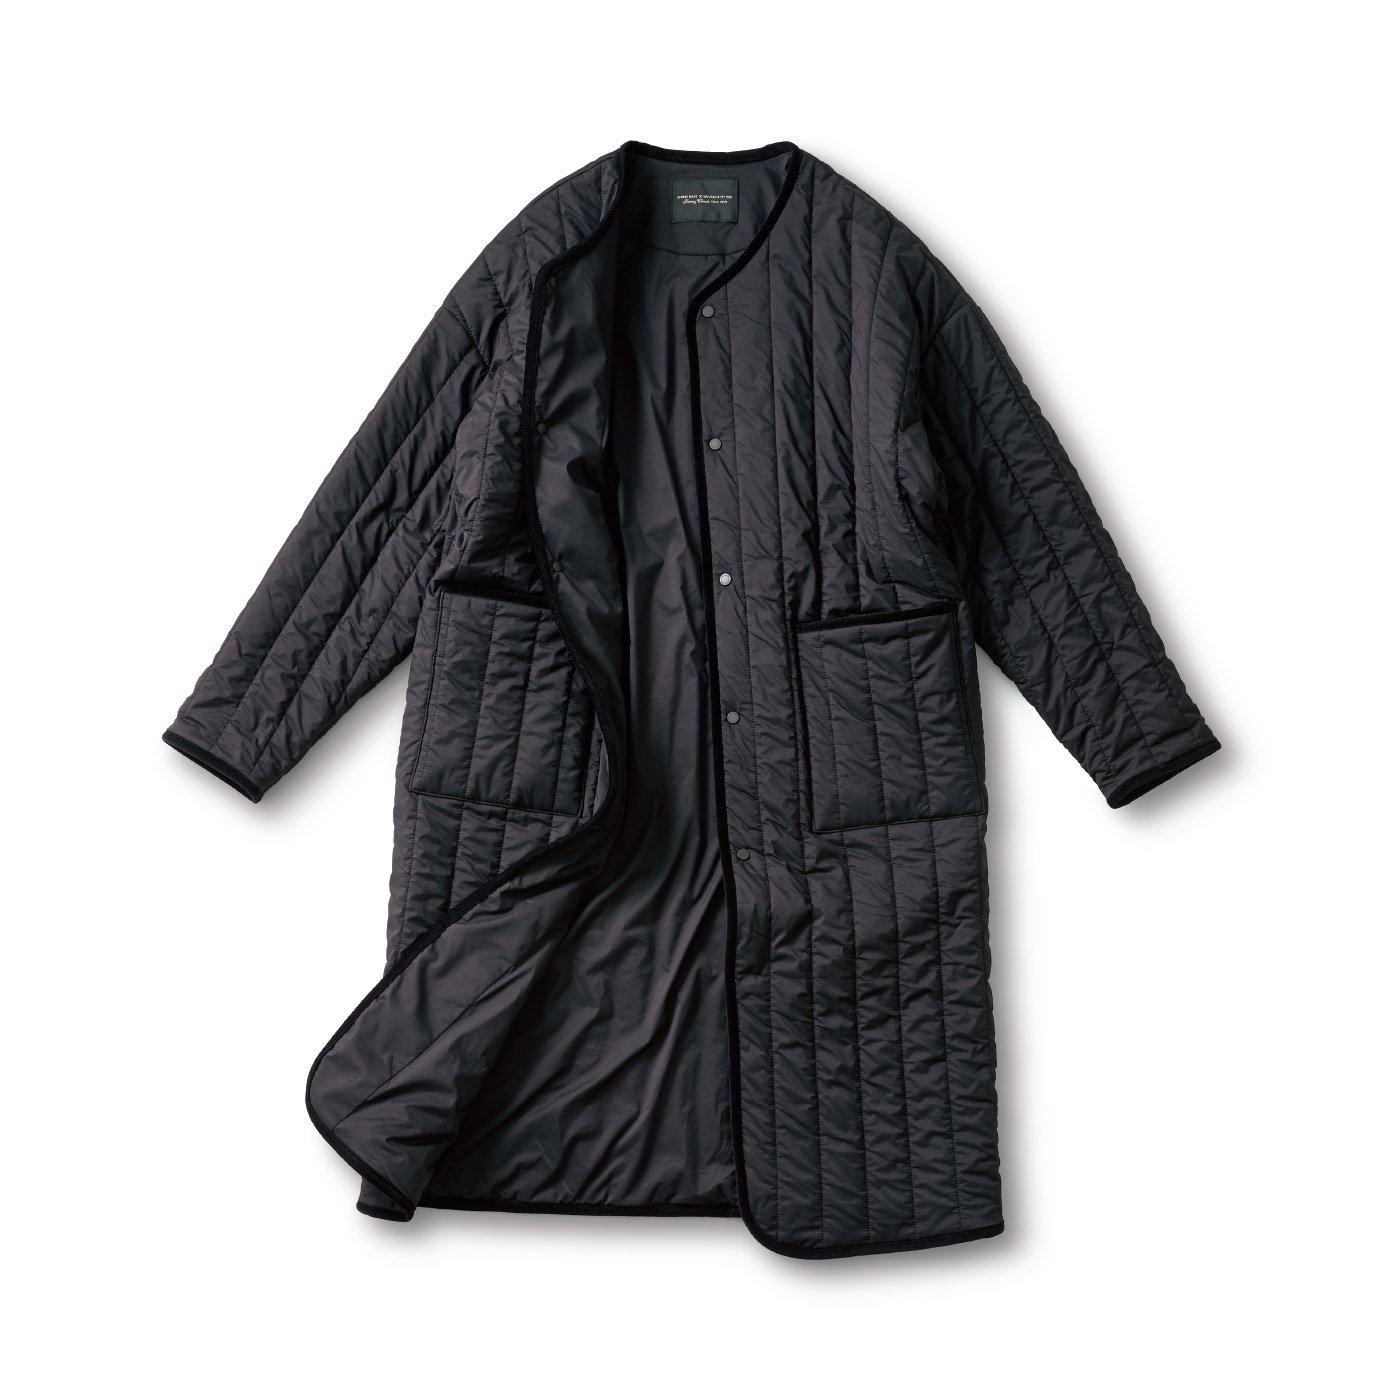 SUNNY CLOUDS 縦キルトのコート〈メンズ〉